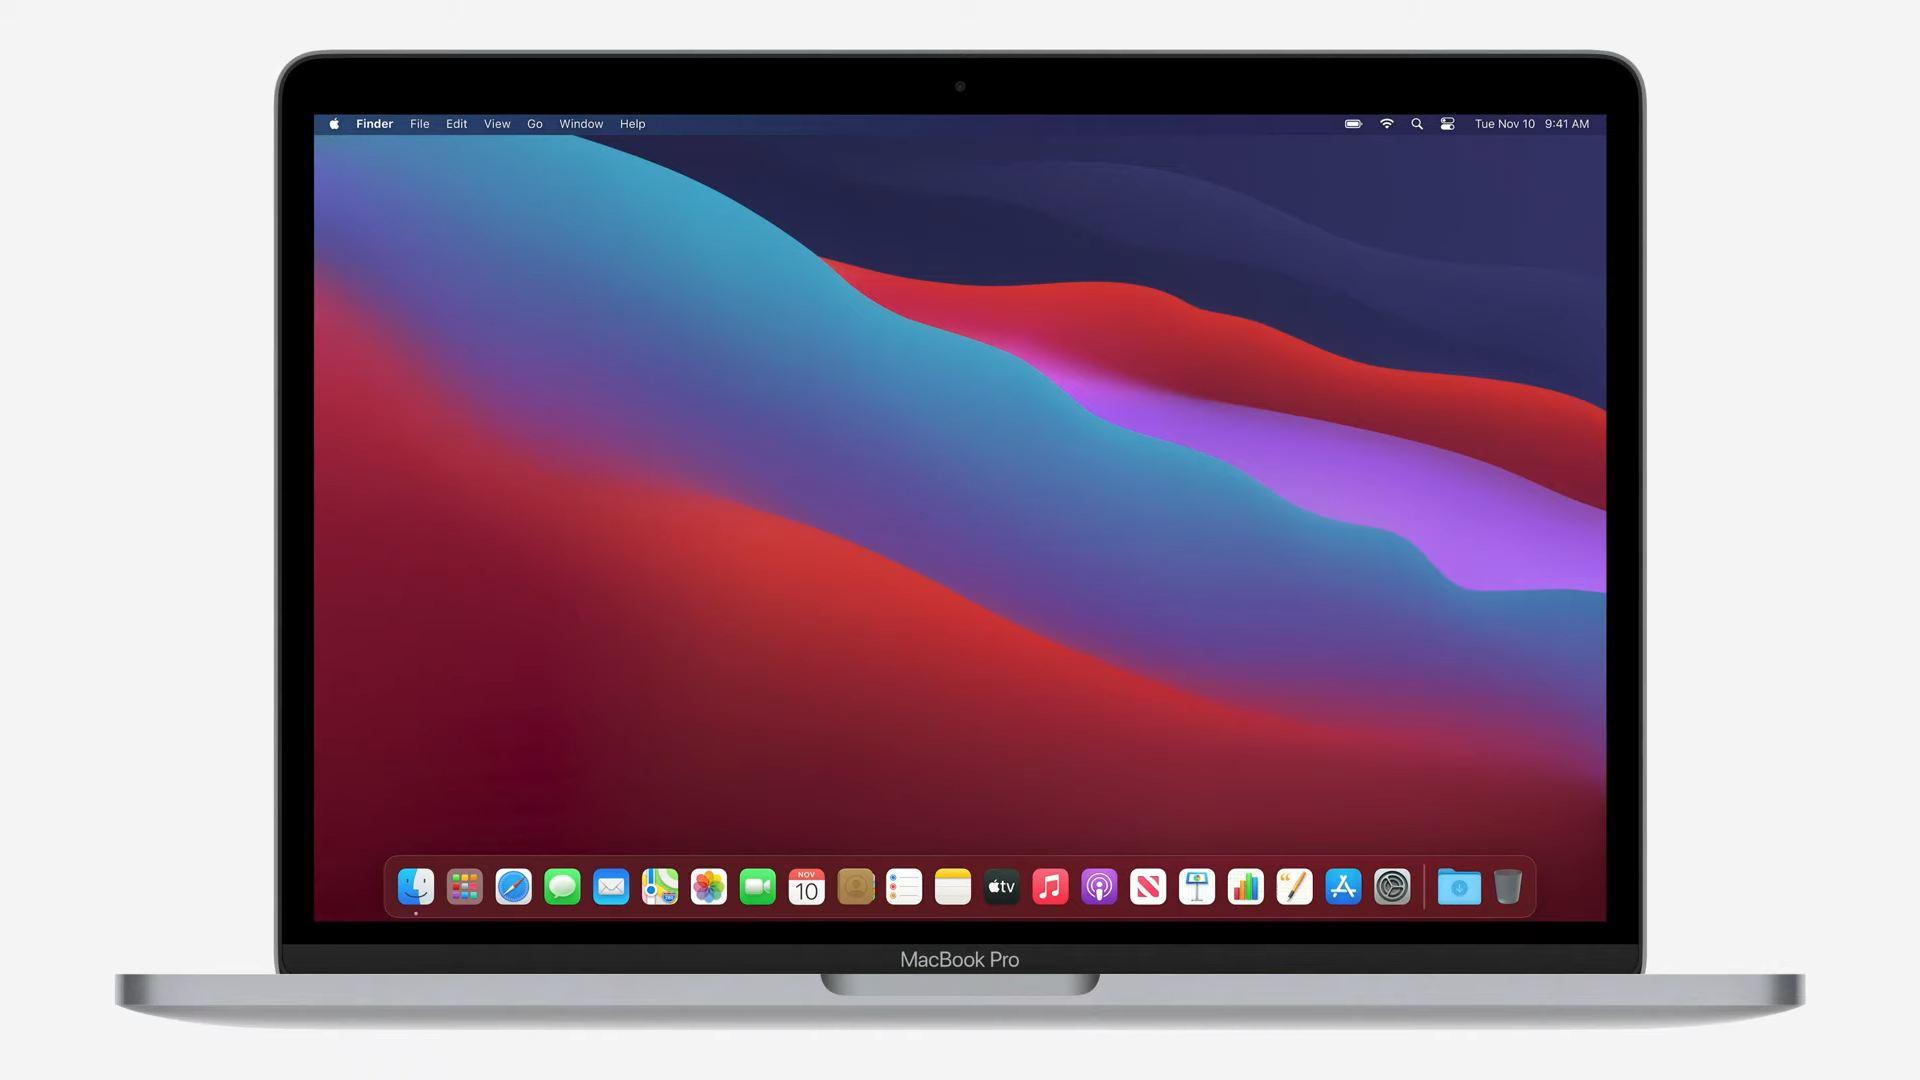 MacBook with Apple M1 Processor Can Still Run Windows 10 OS